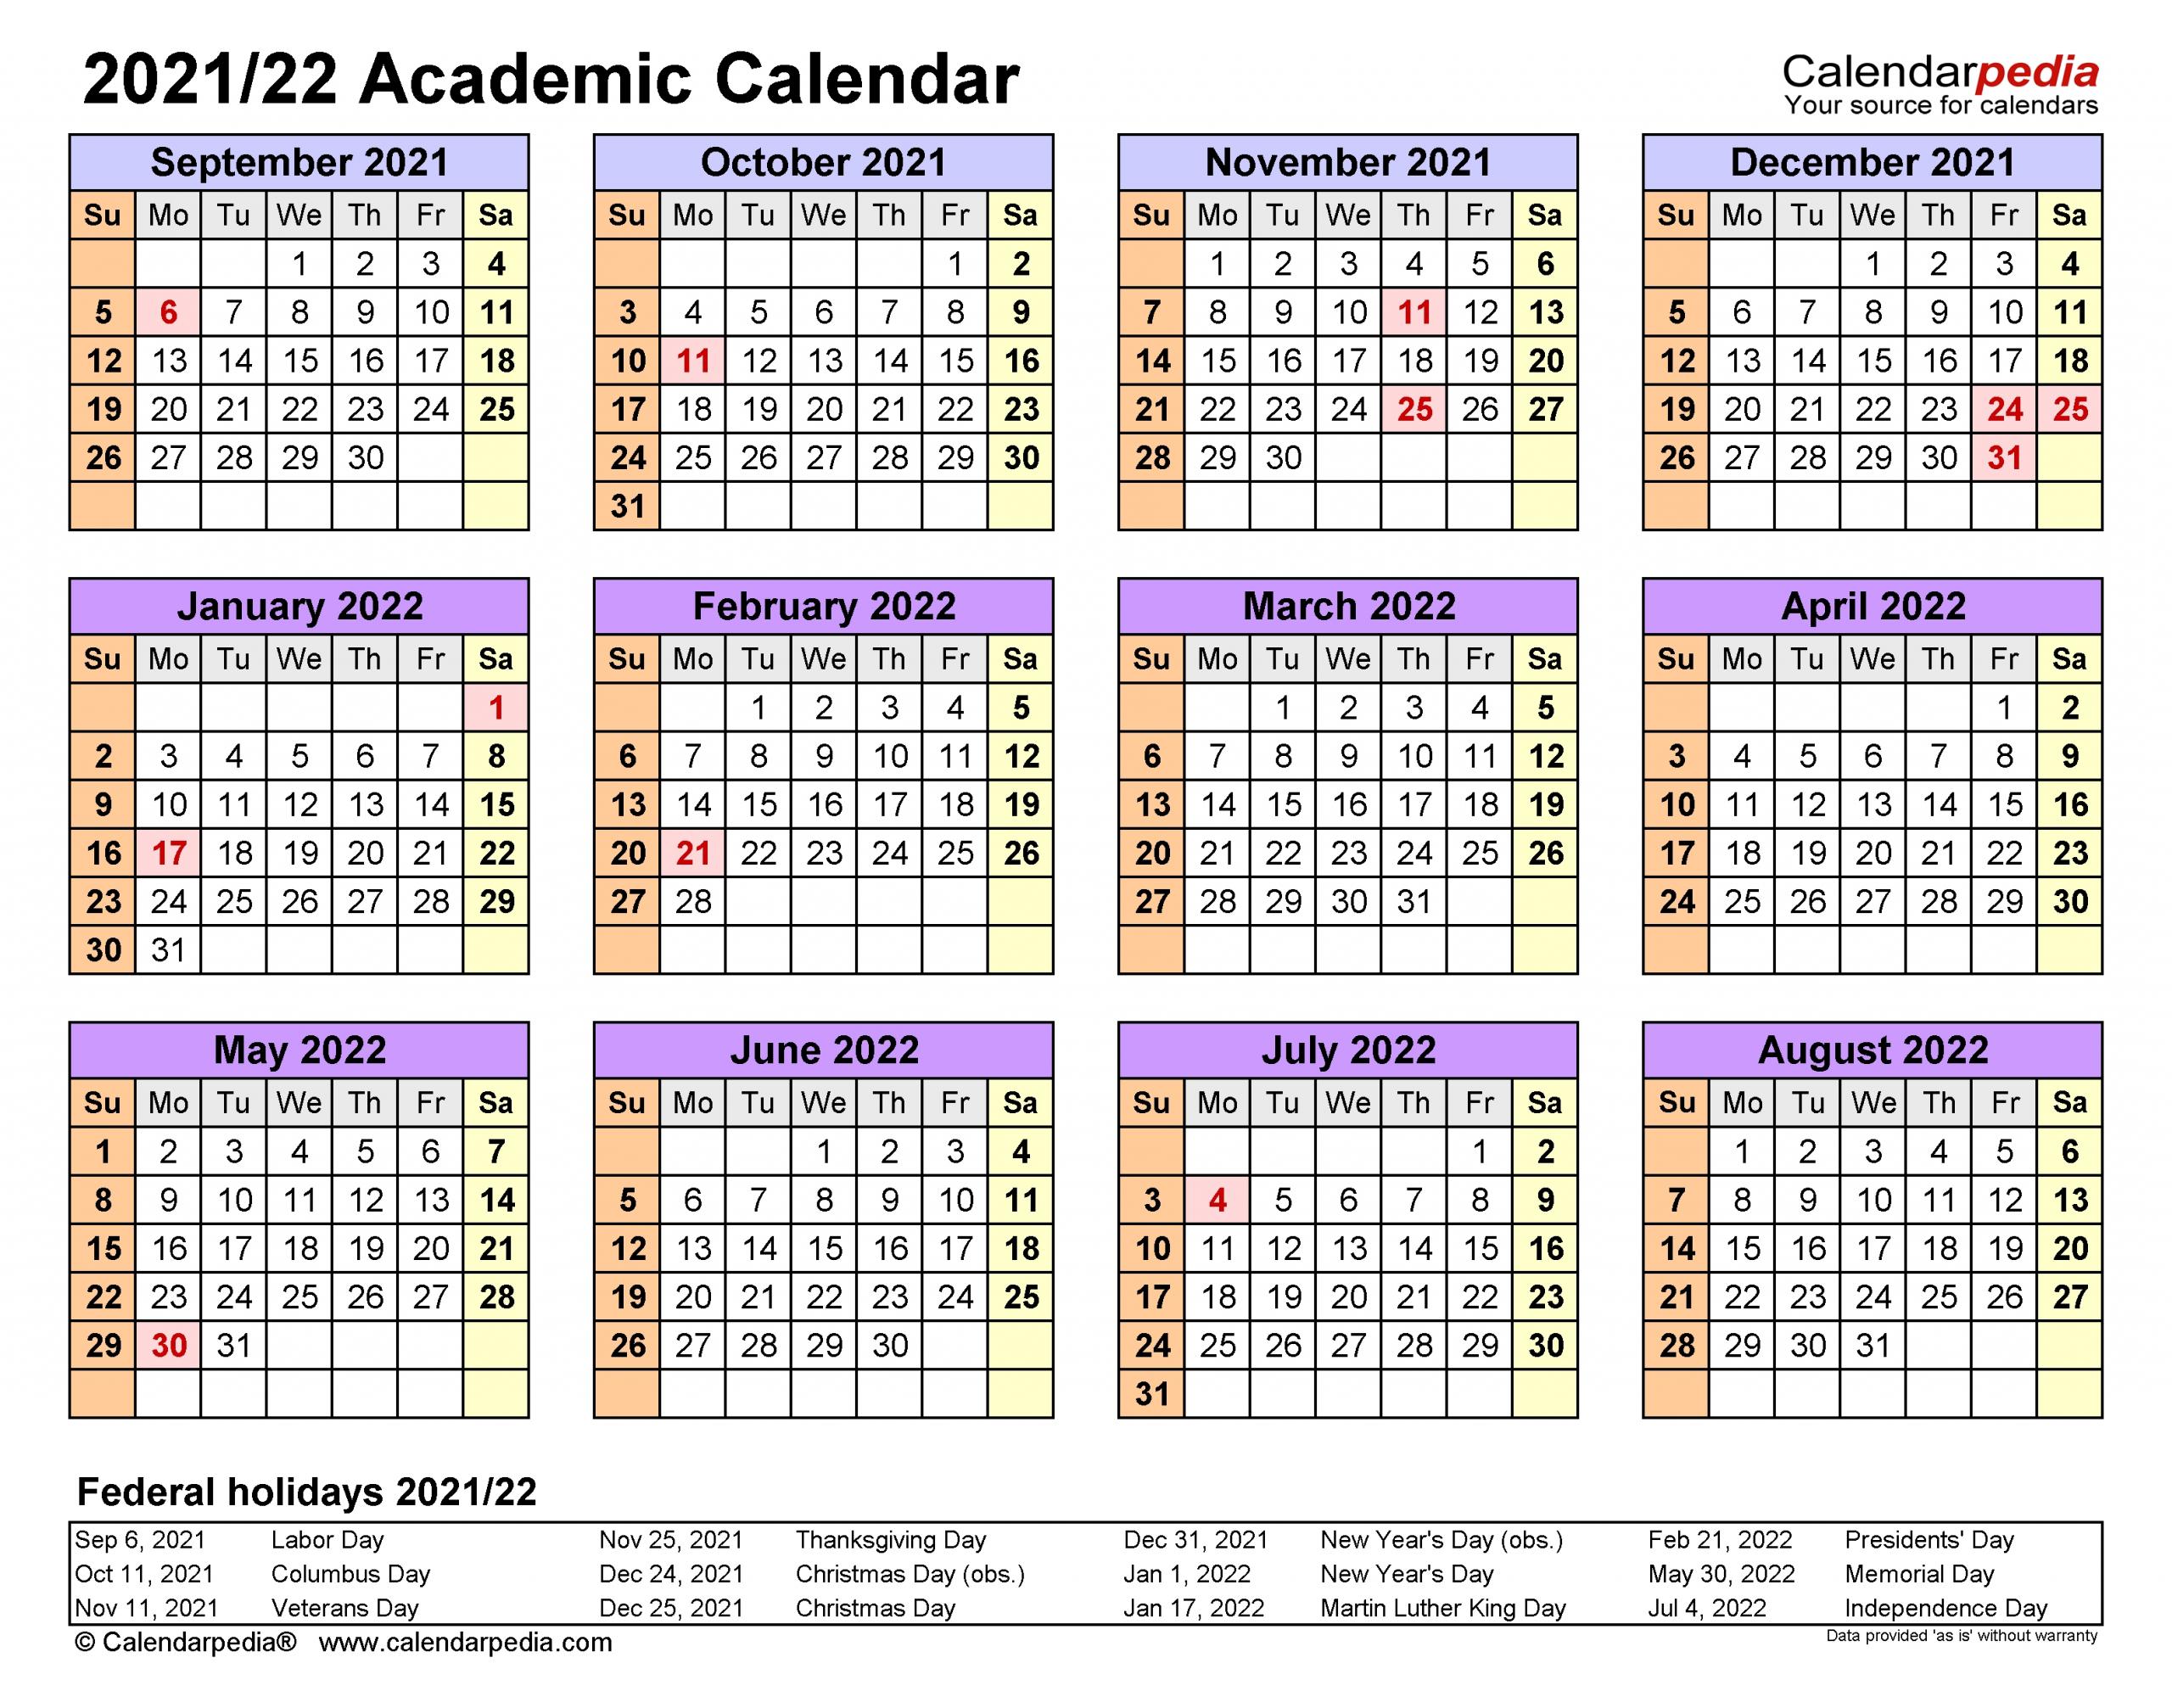 Academic Calendars 2021/2022 - Free Printable Word Templates